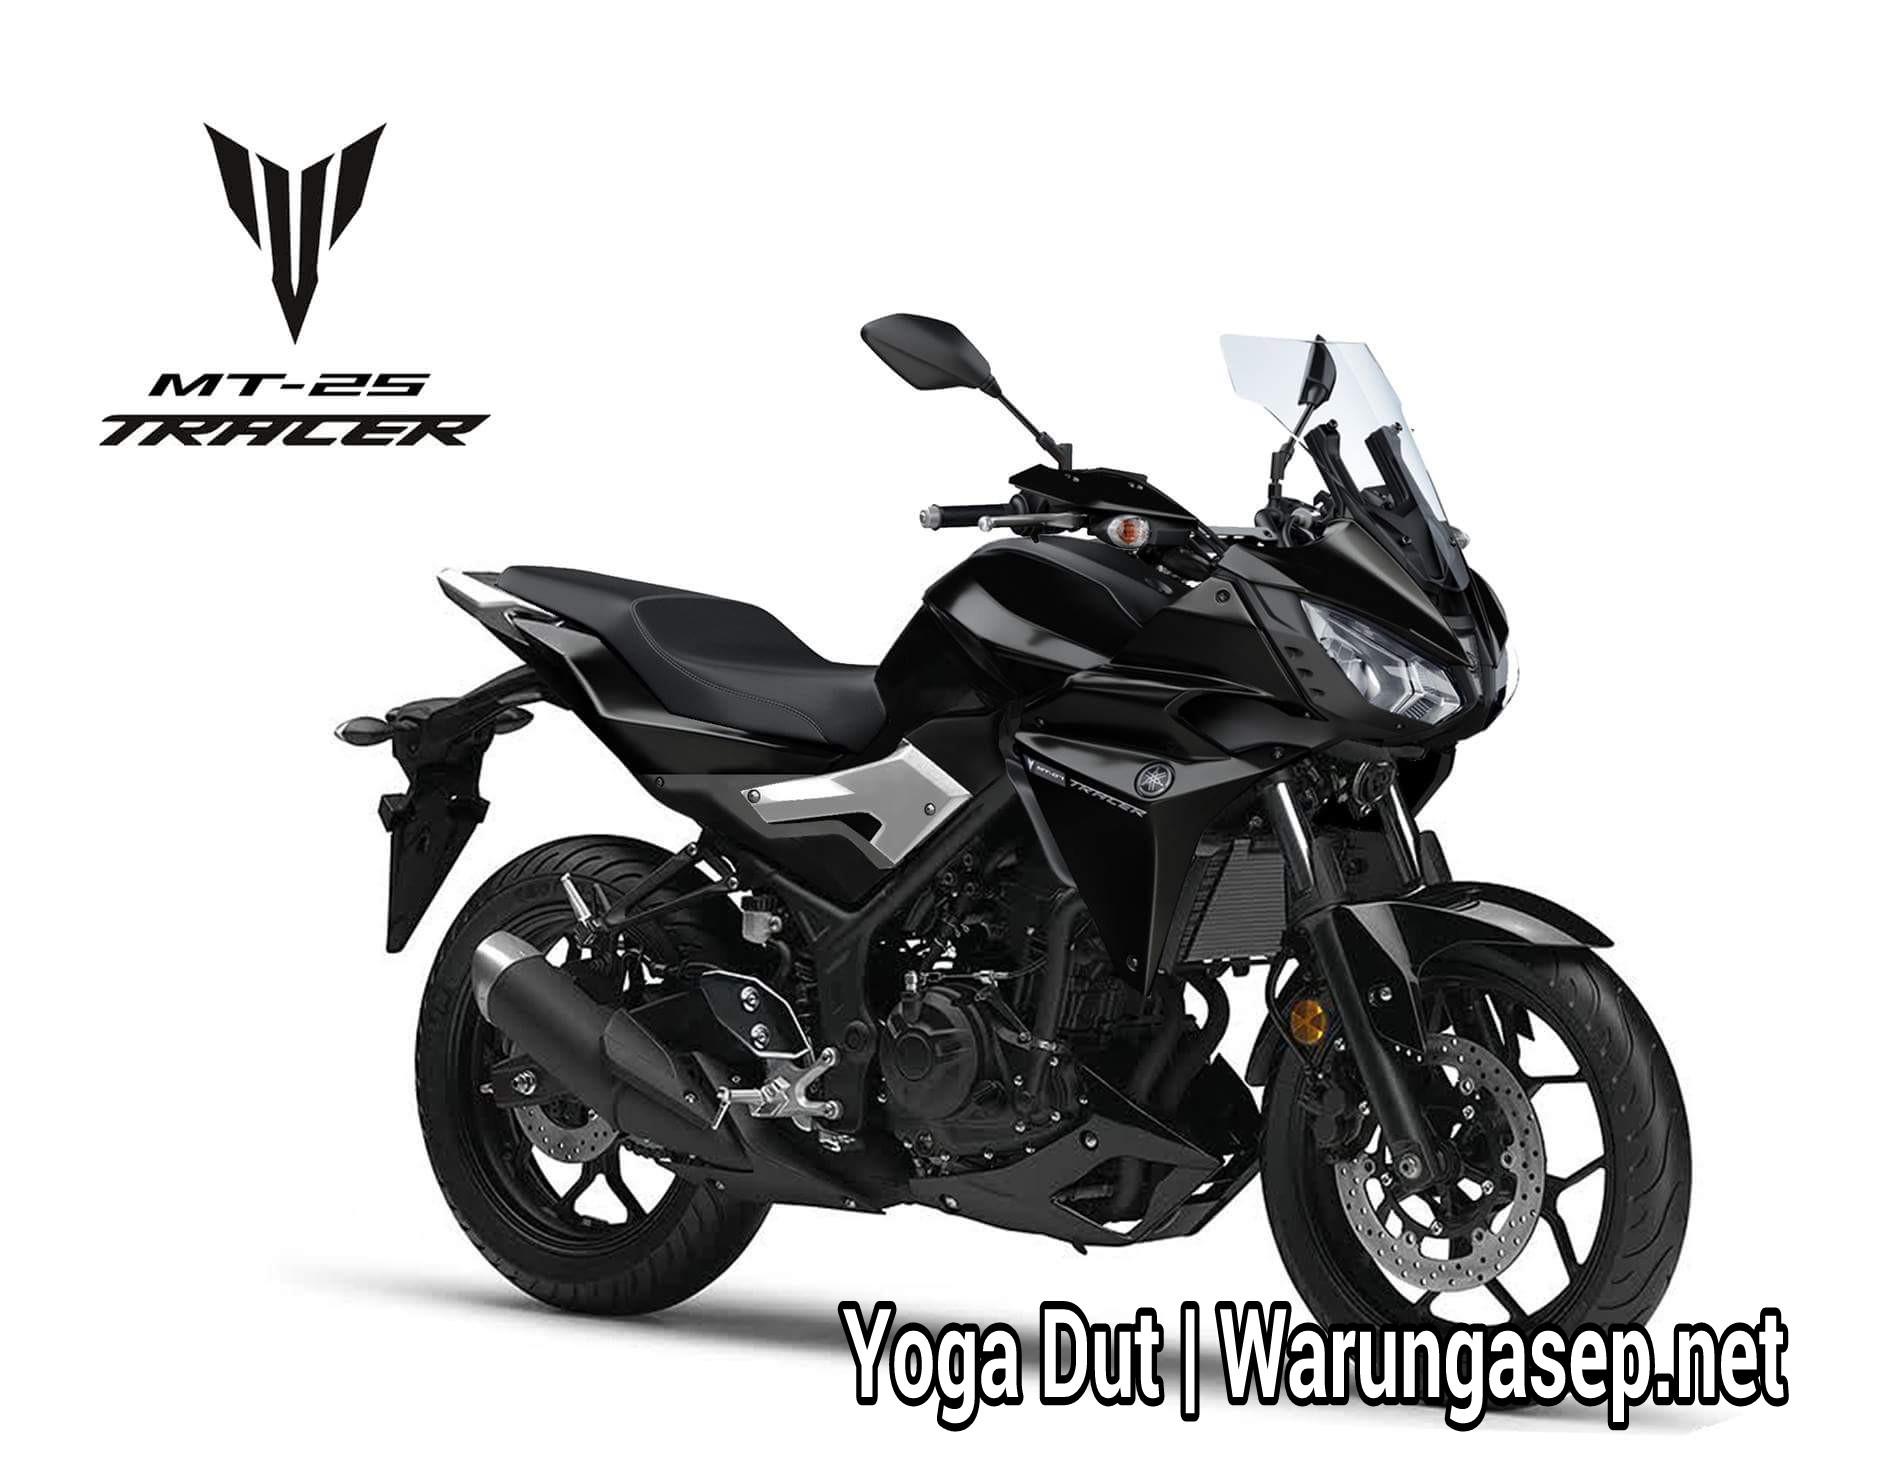 yamaha mt-25 tracer… konsep motor 250cc adventure dari yamaha